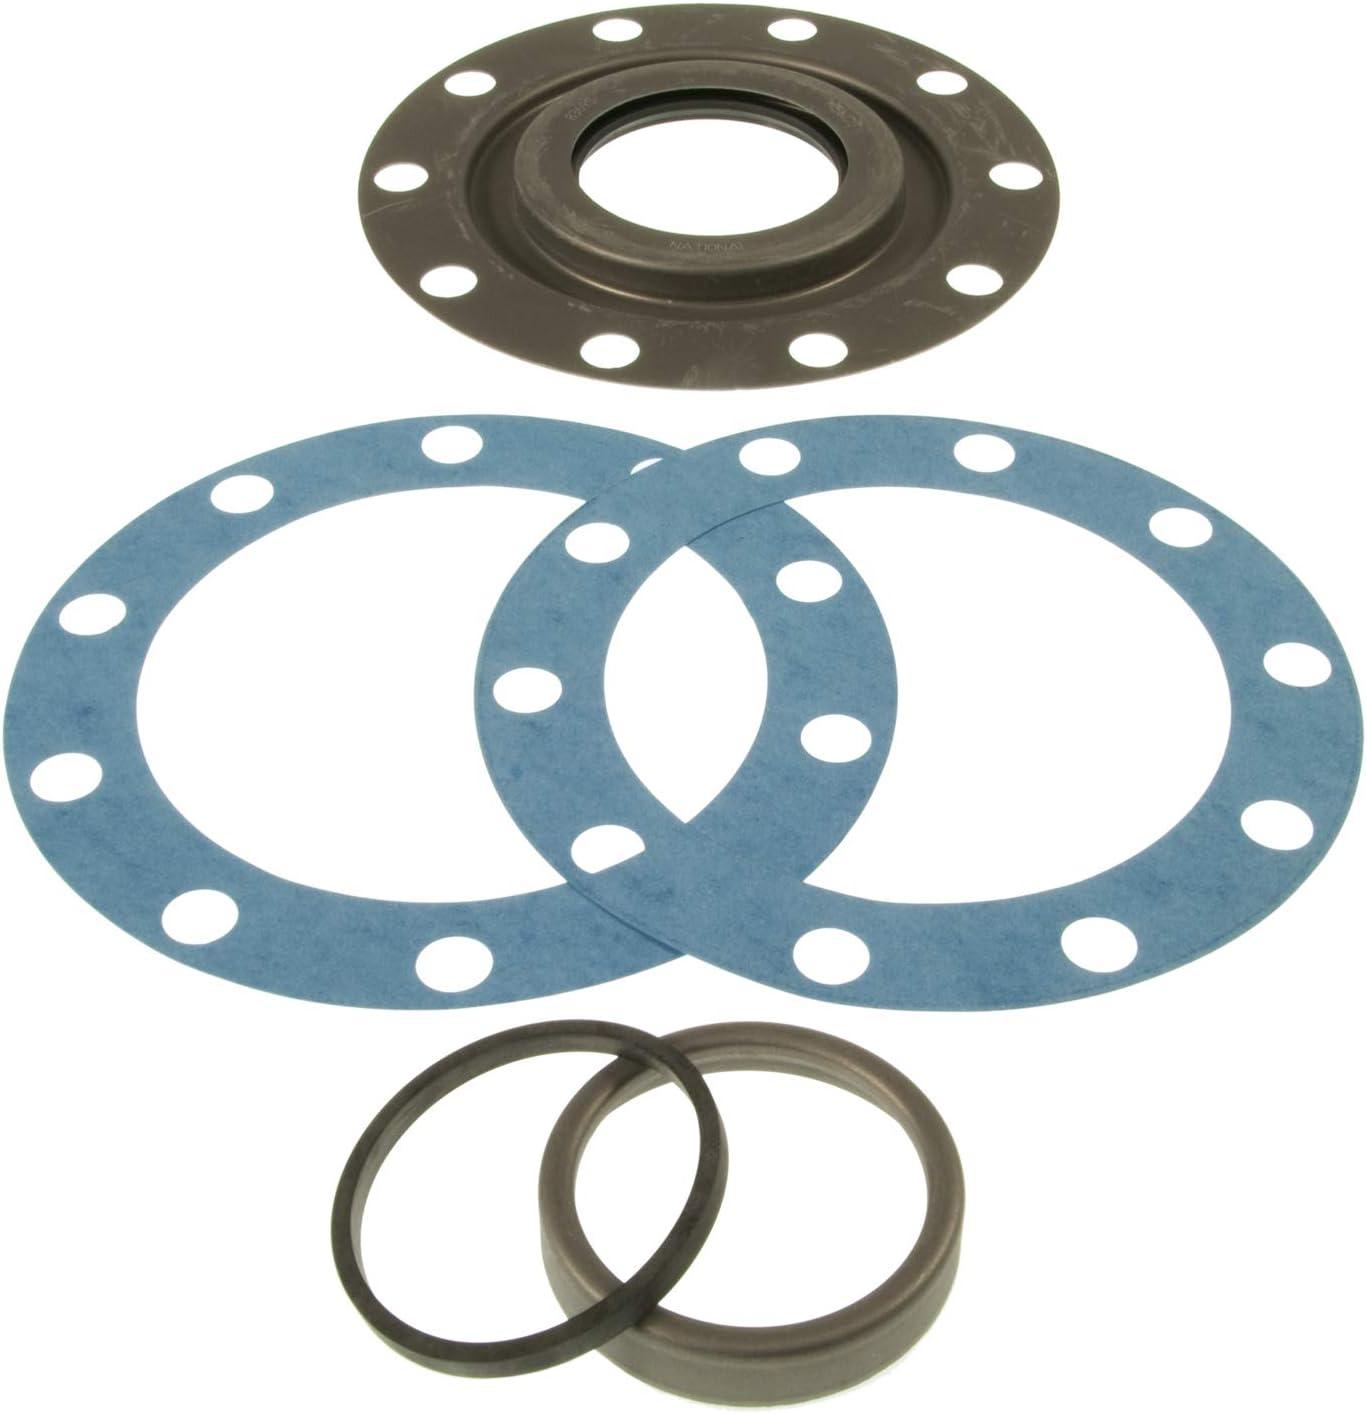 Motors Replacement Parts National 5313 Oil Seal Kit tpr.sa